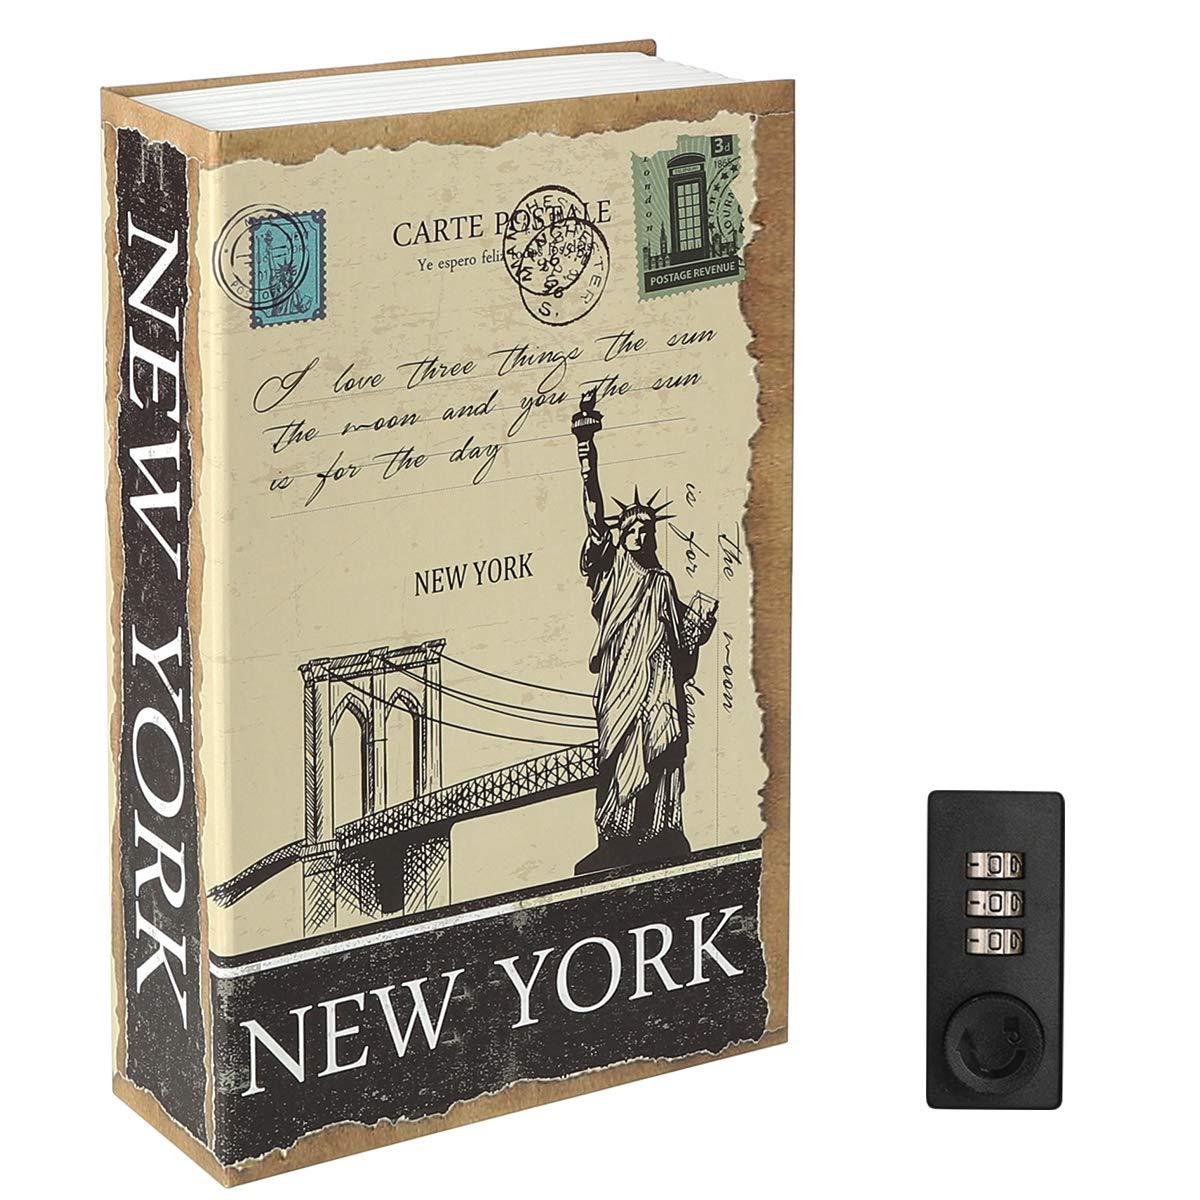 "Diversion Book Safe with Combination Lock, Decaller Safe Secret Hidden Metal Lock Box, 9 1/2"" x 6"" x 1 1/3"", New York"